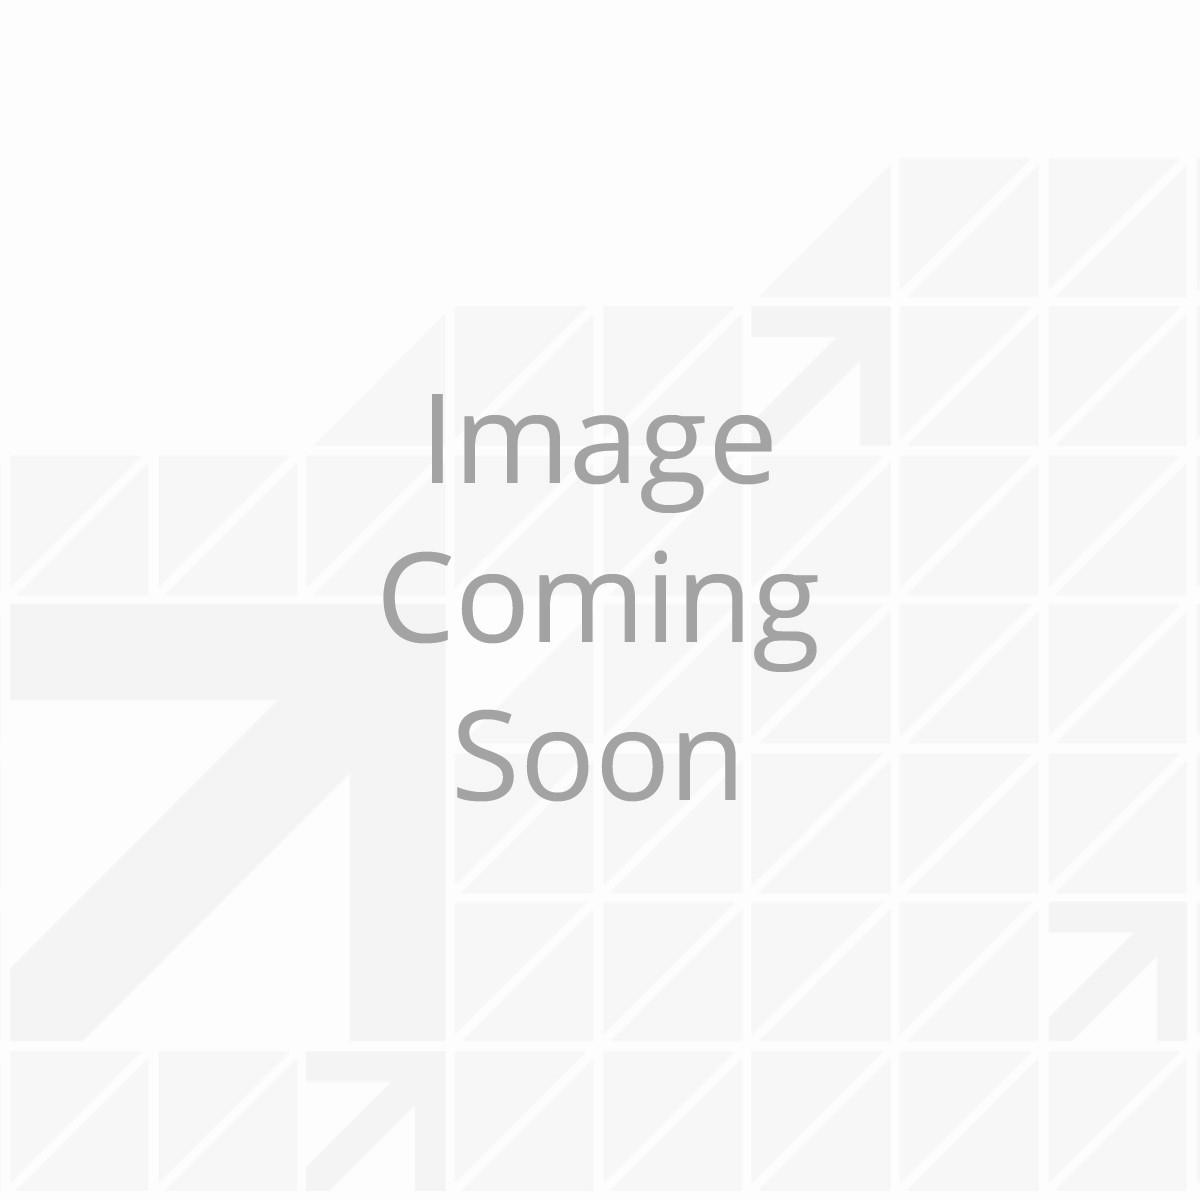 276602_Gear-Box_001